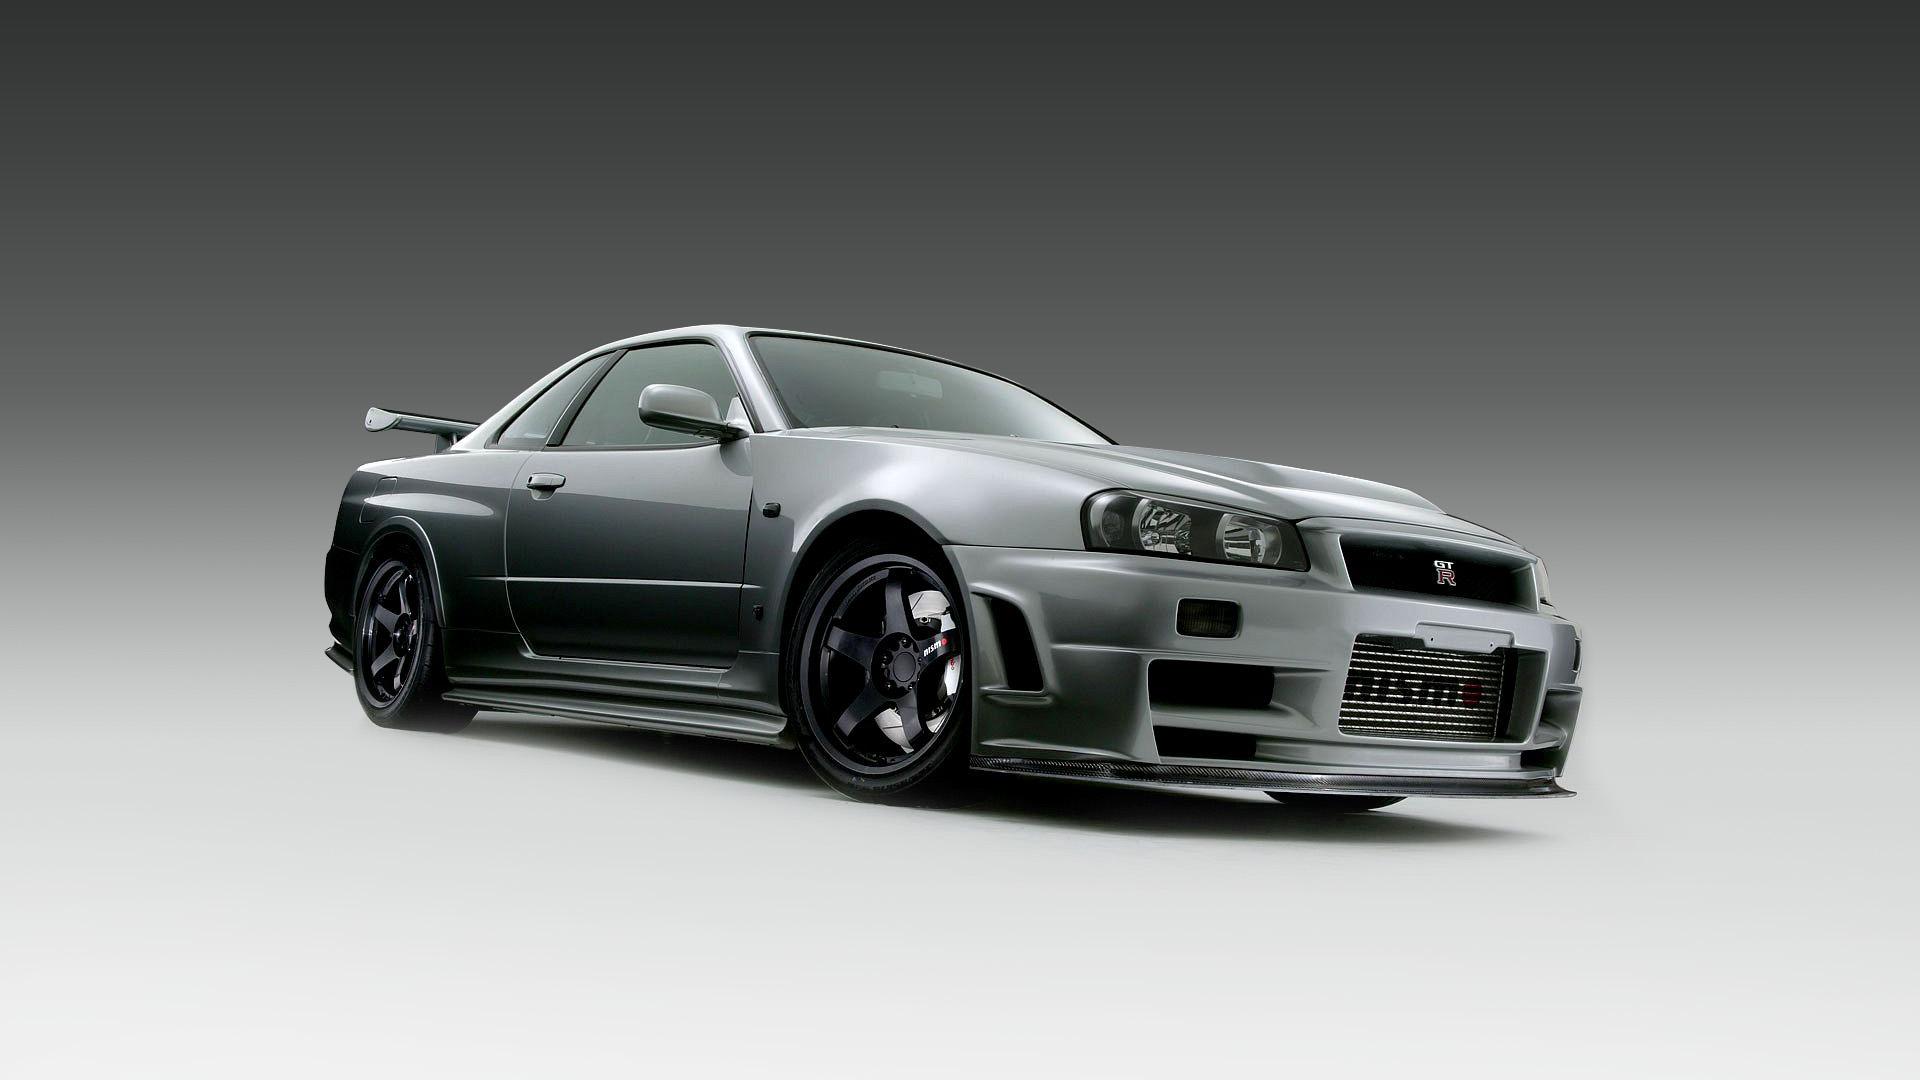 2001 Nissan Skyline R34 GT R Nismo Wallpapers 1920x1080